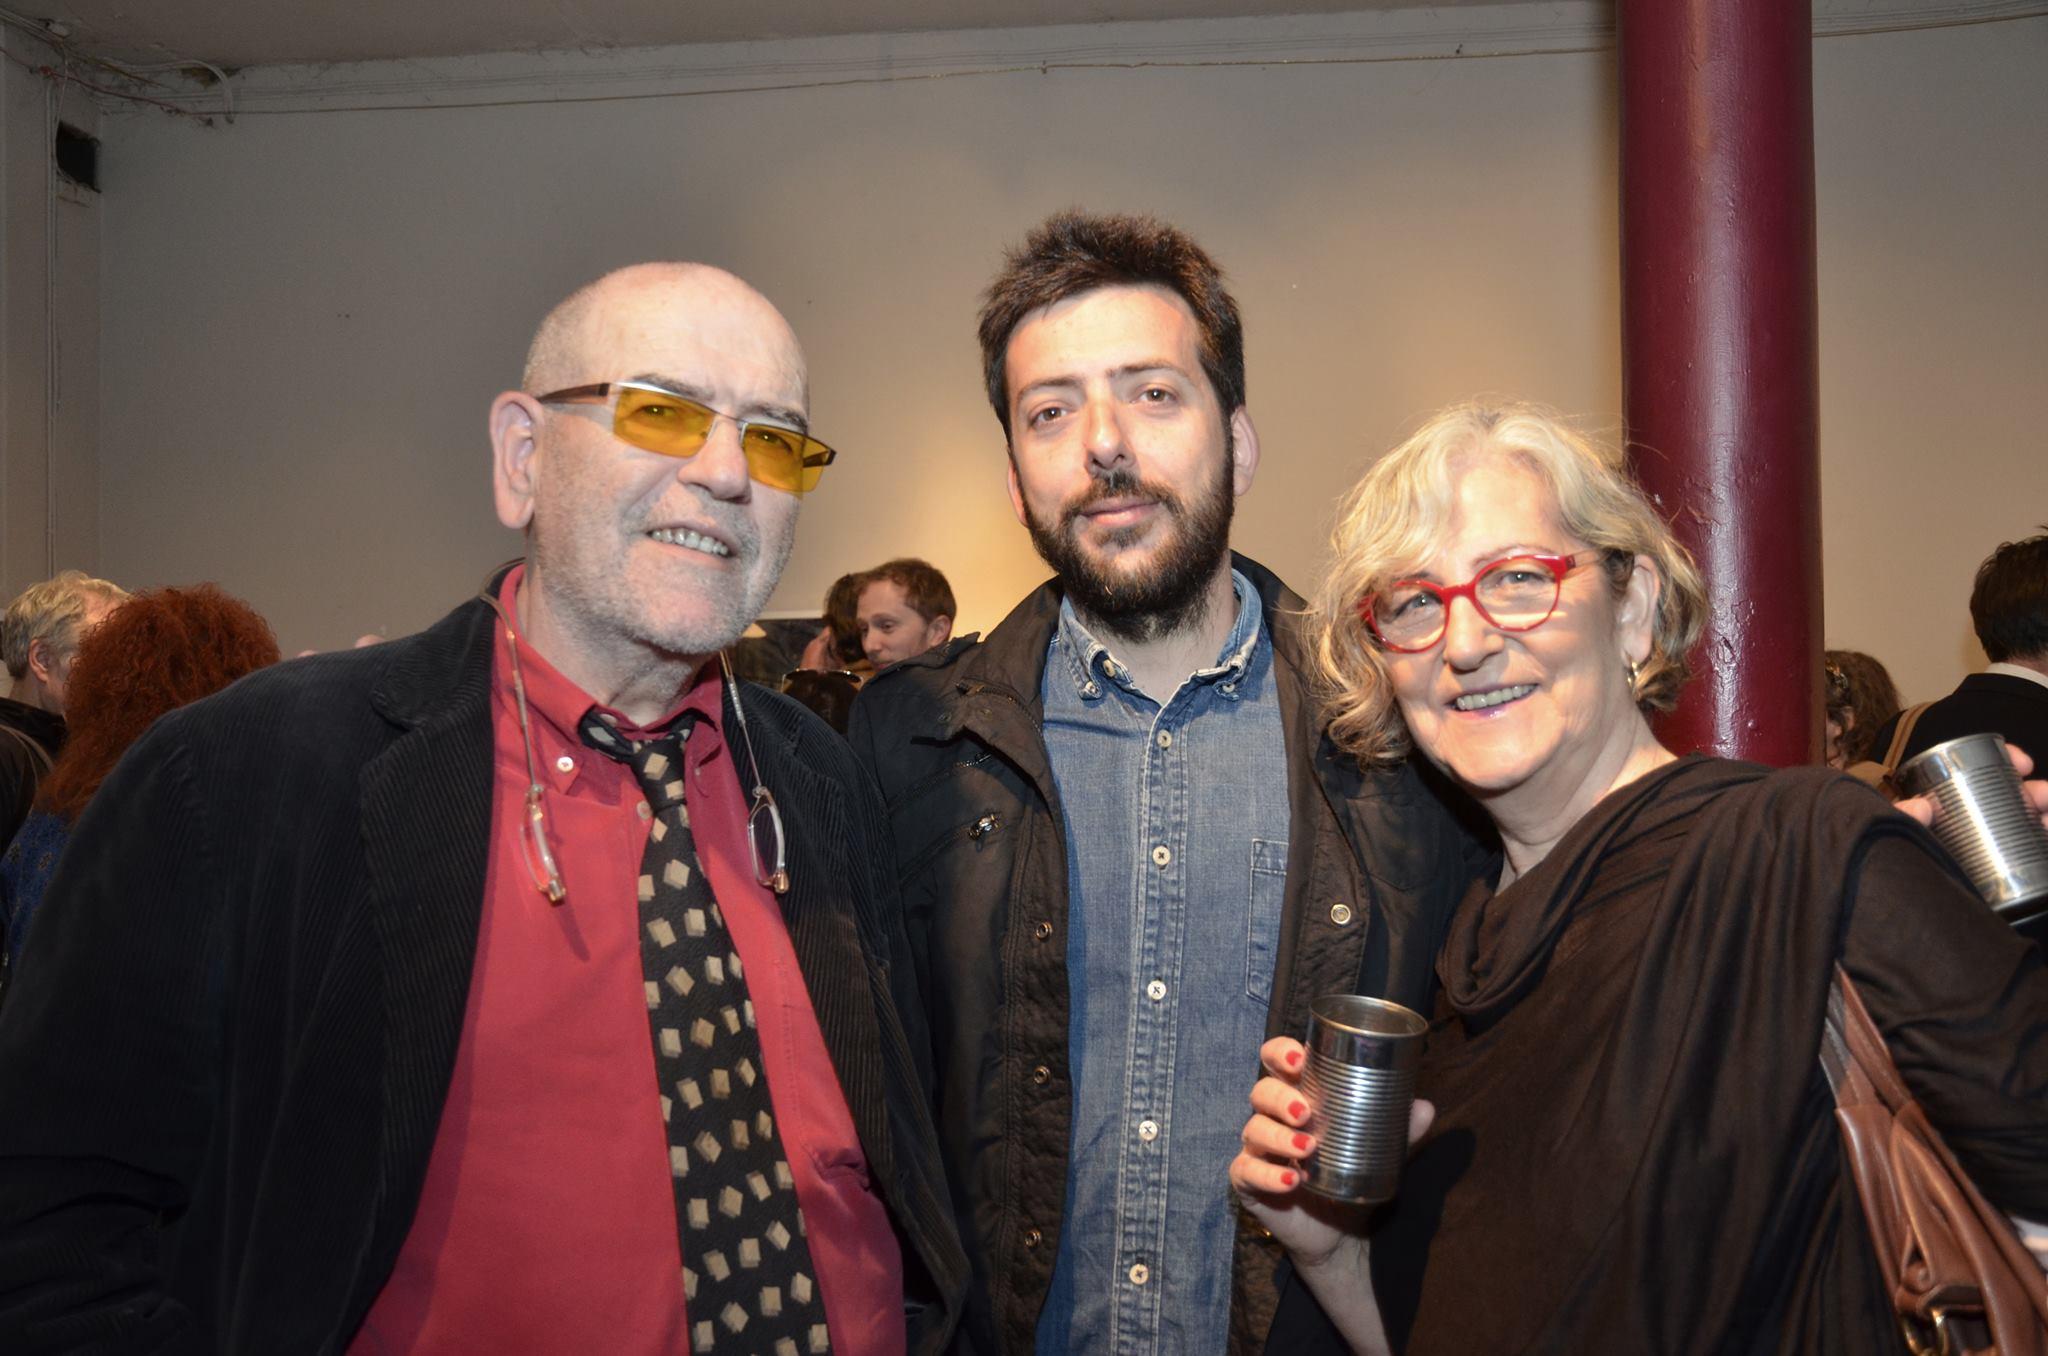 Jaume, Arnau and Carmen Bach